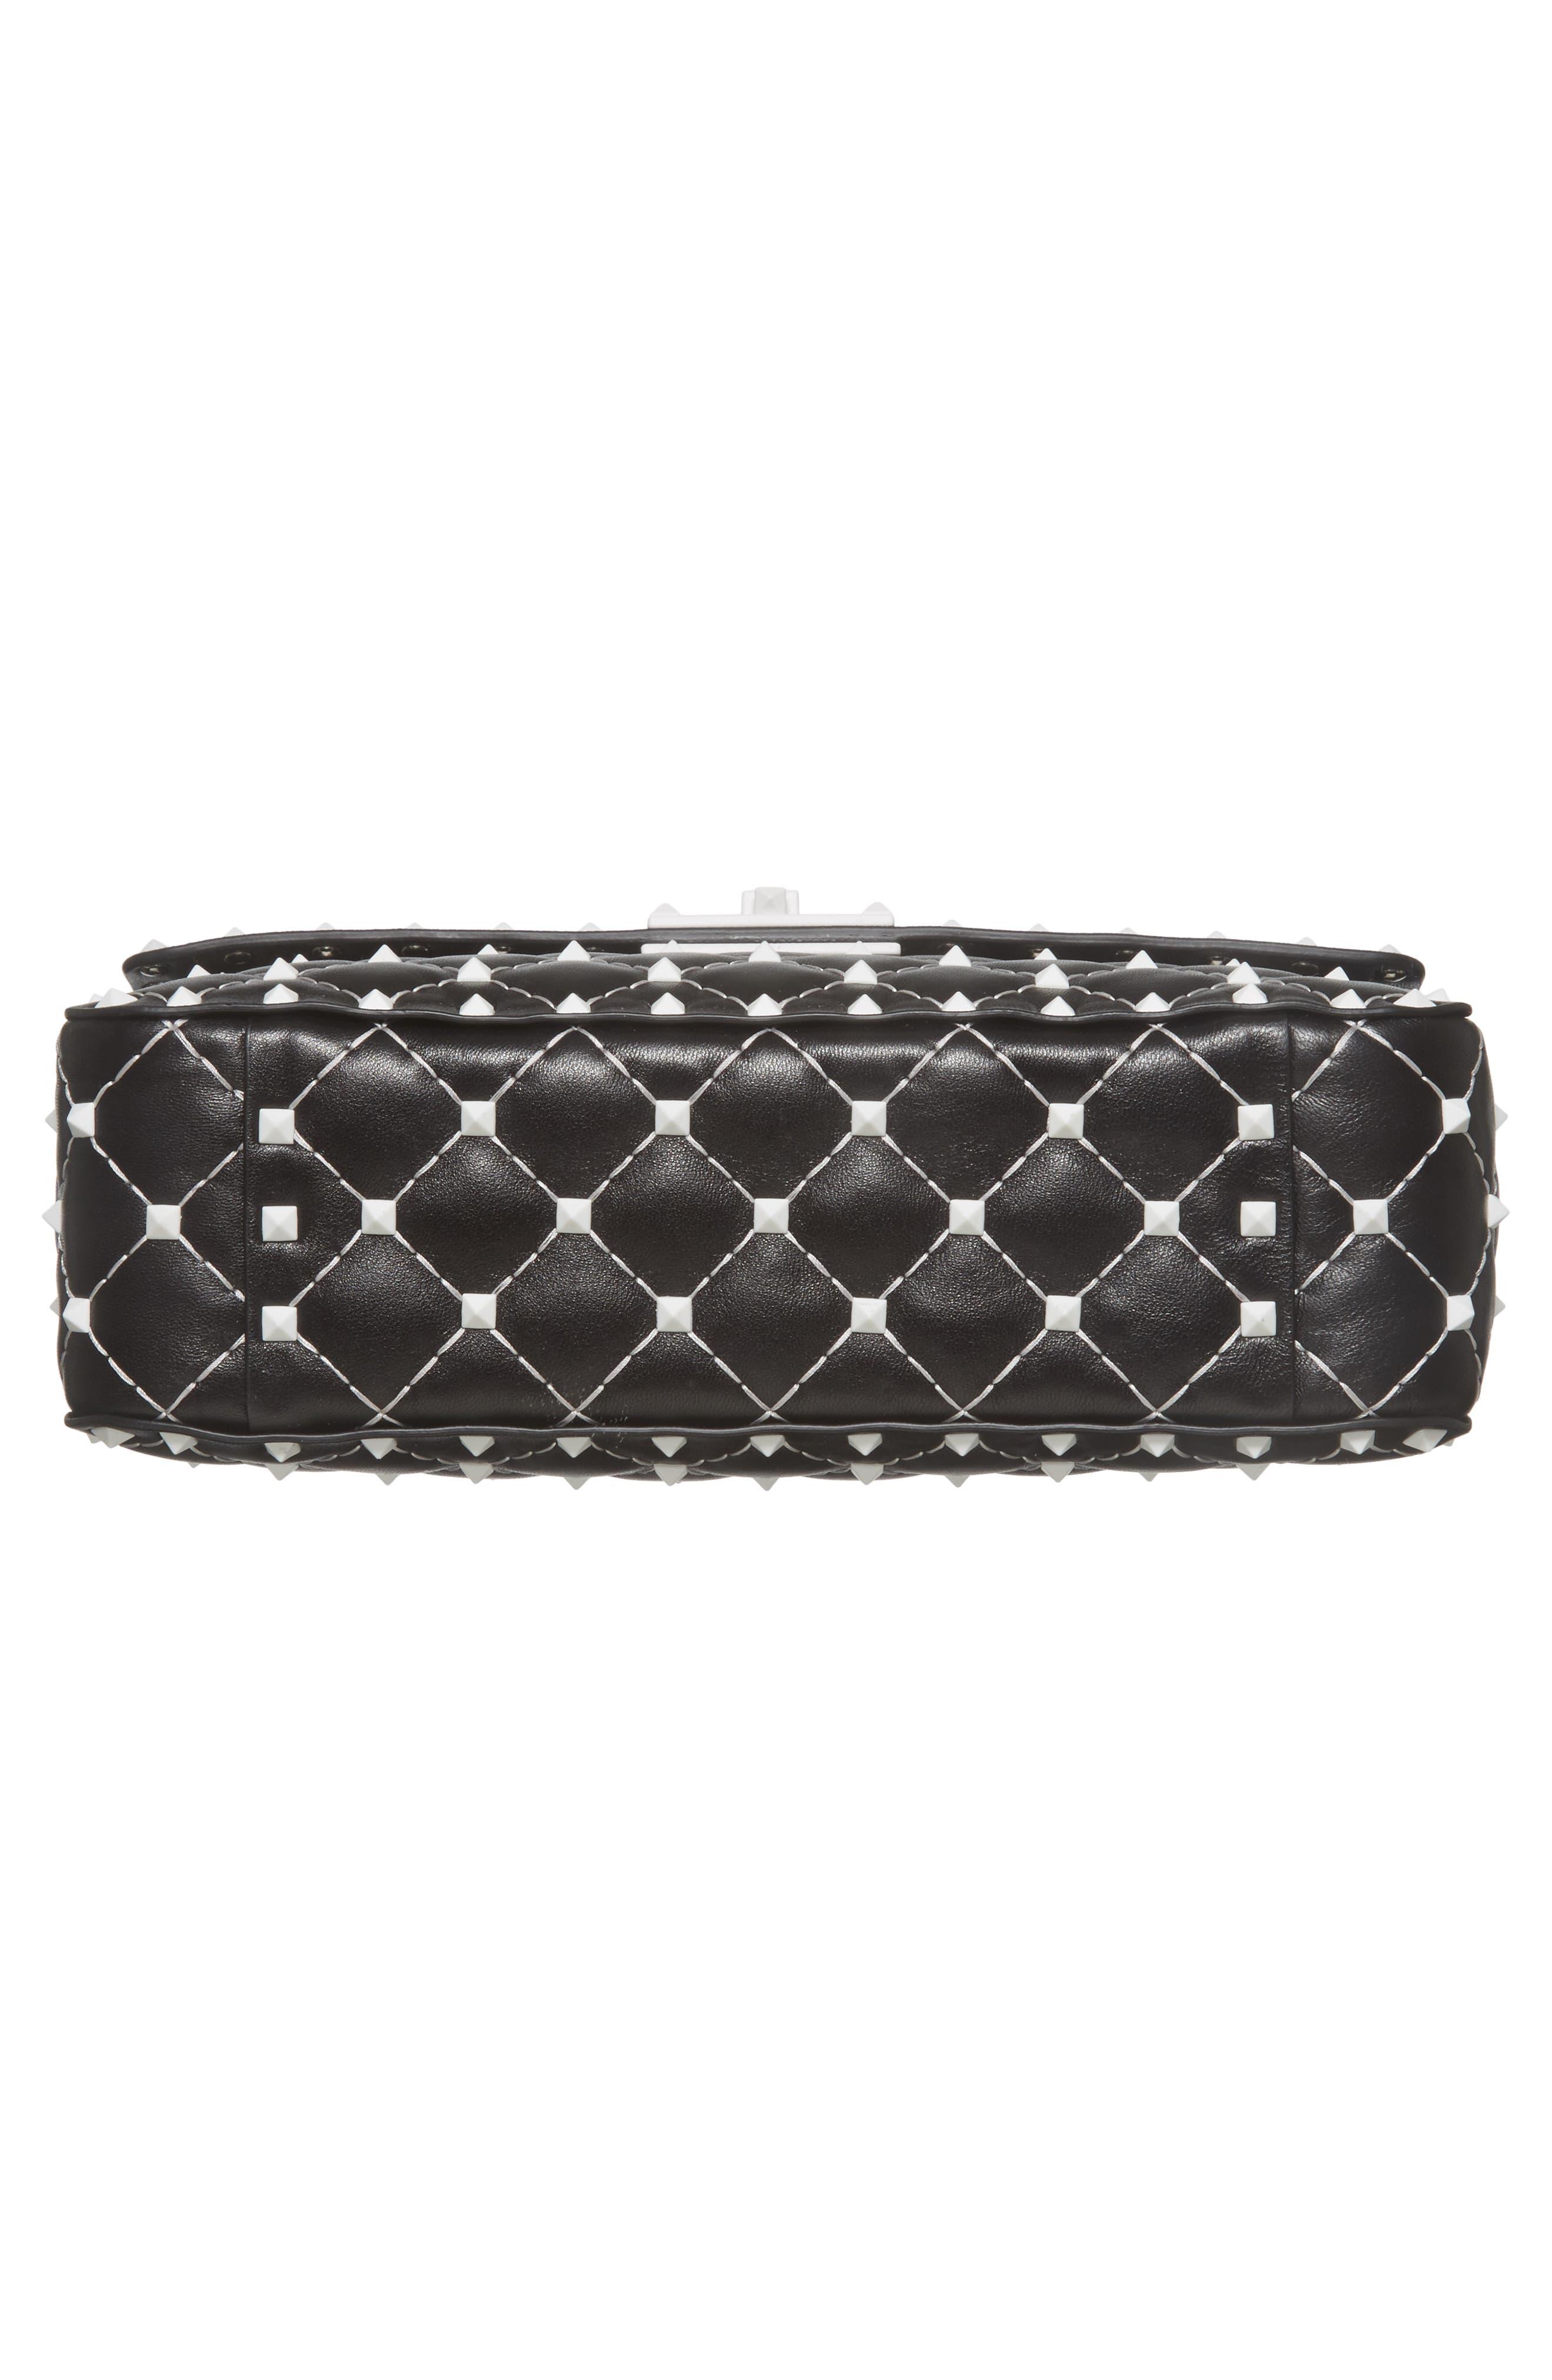 Medium Rockstud Matelassé Leather Shoulder Bag,                             Alternate thumbnail 6, color,                             Black